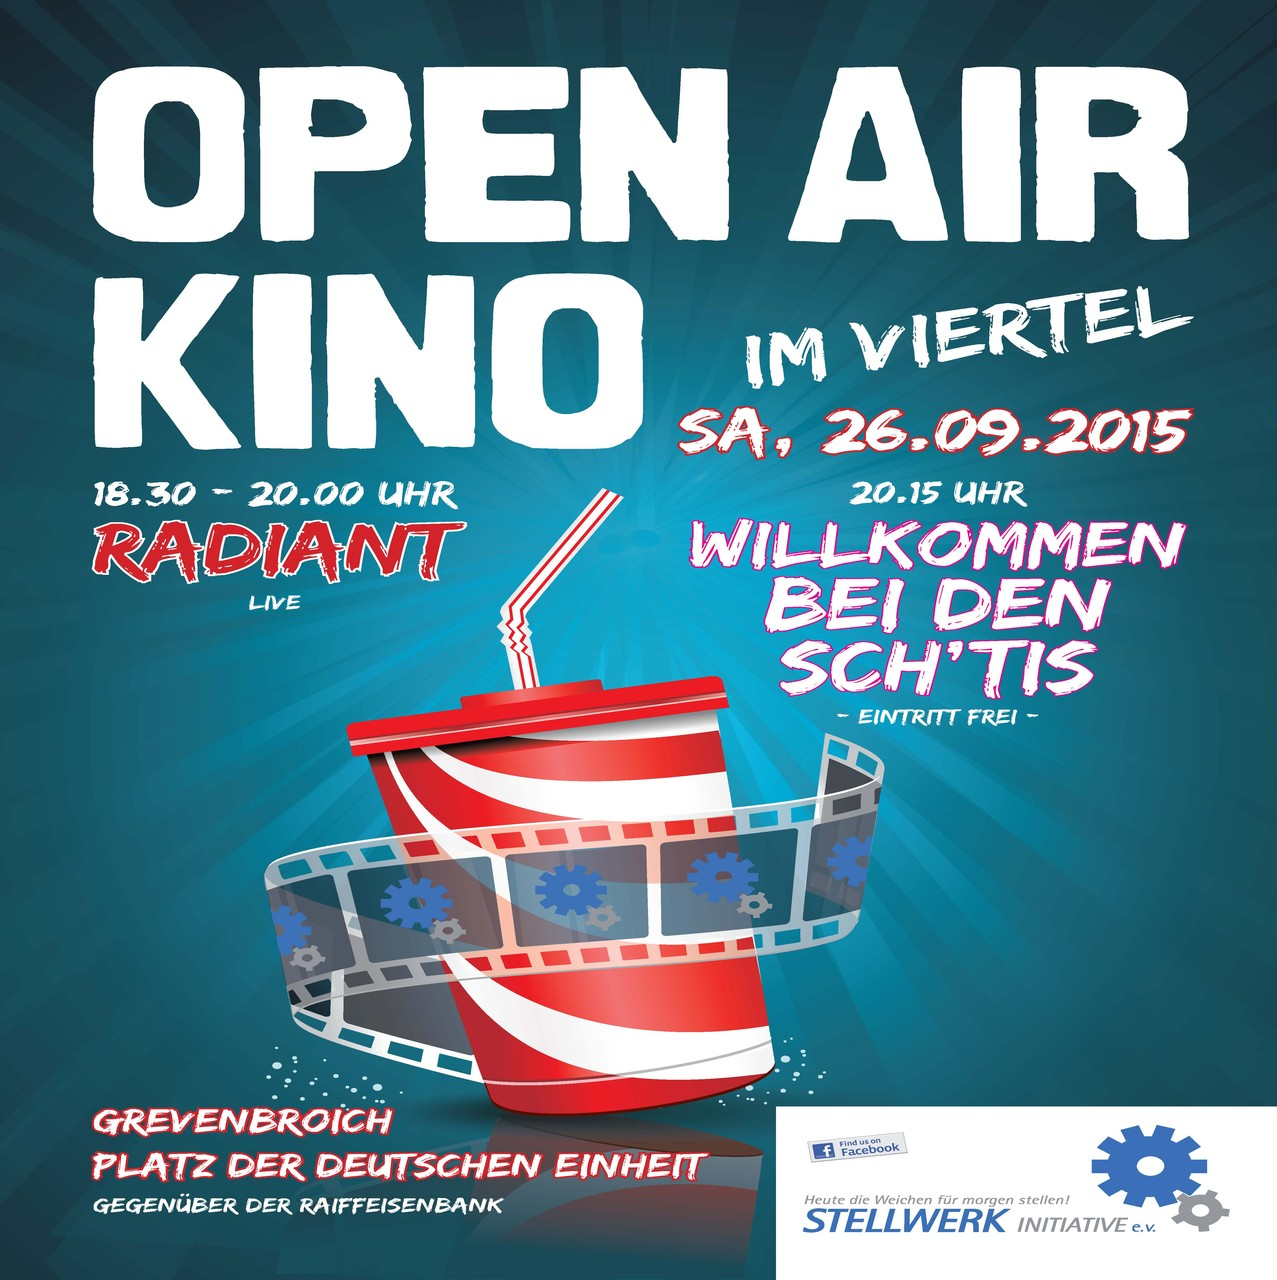 Plakat für unser Openair-Kino